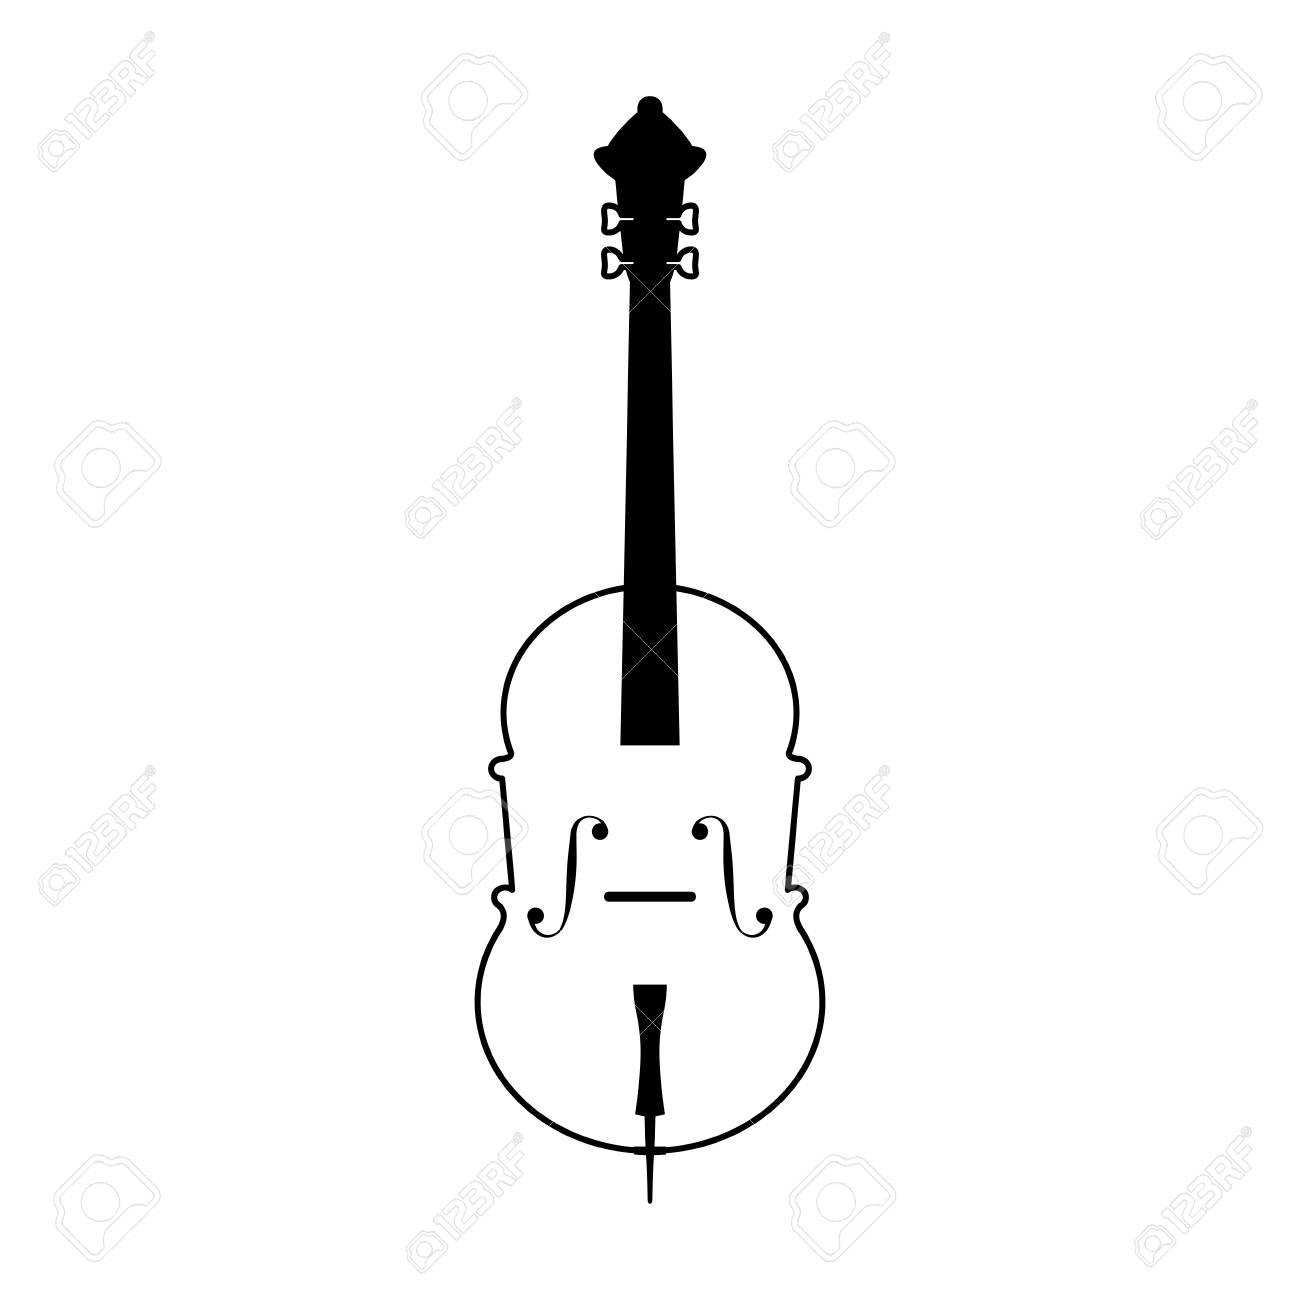 Cello Musical Instrument Icon Image Vector Illustration Design Black And White Stock